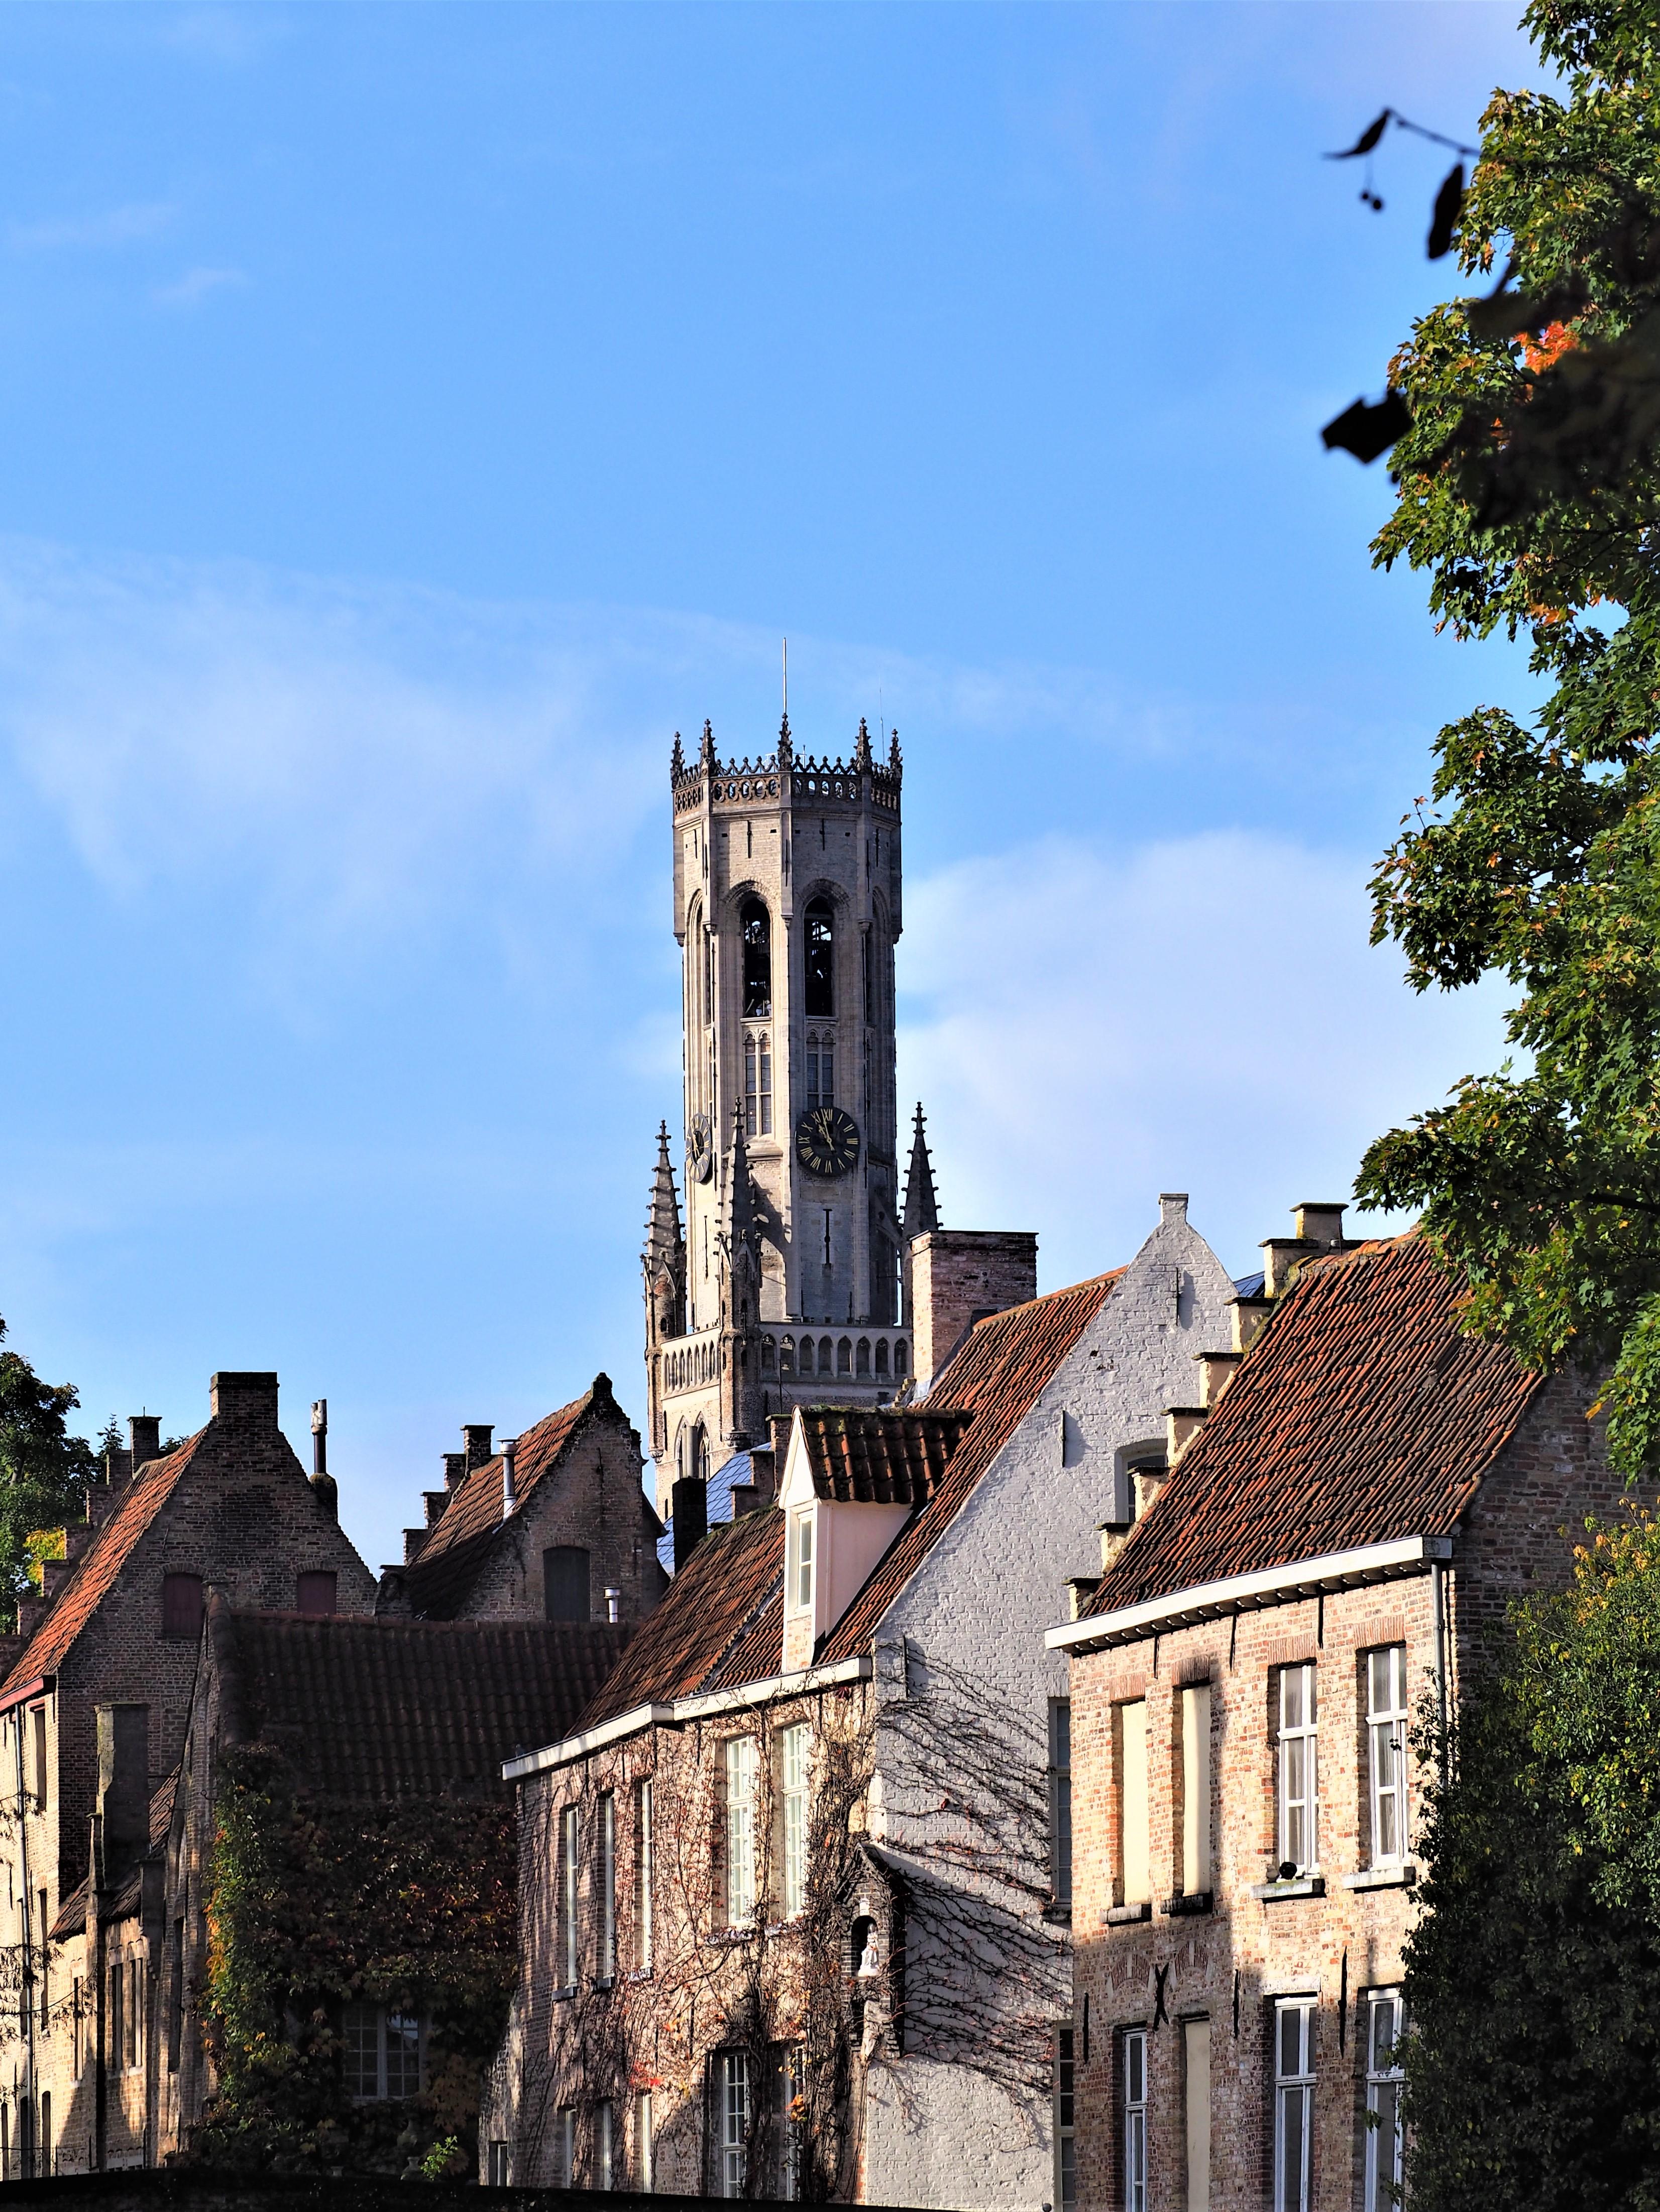 Bruges-Belgique-blog-voyage-clioandco-Beffroi